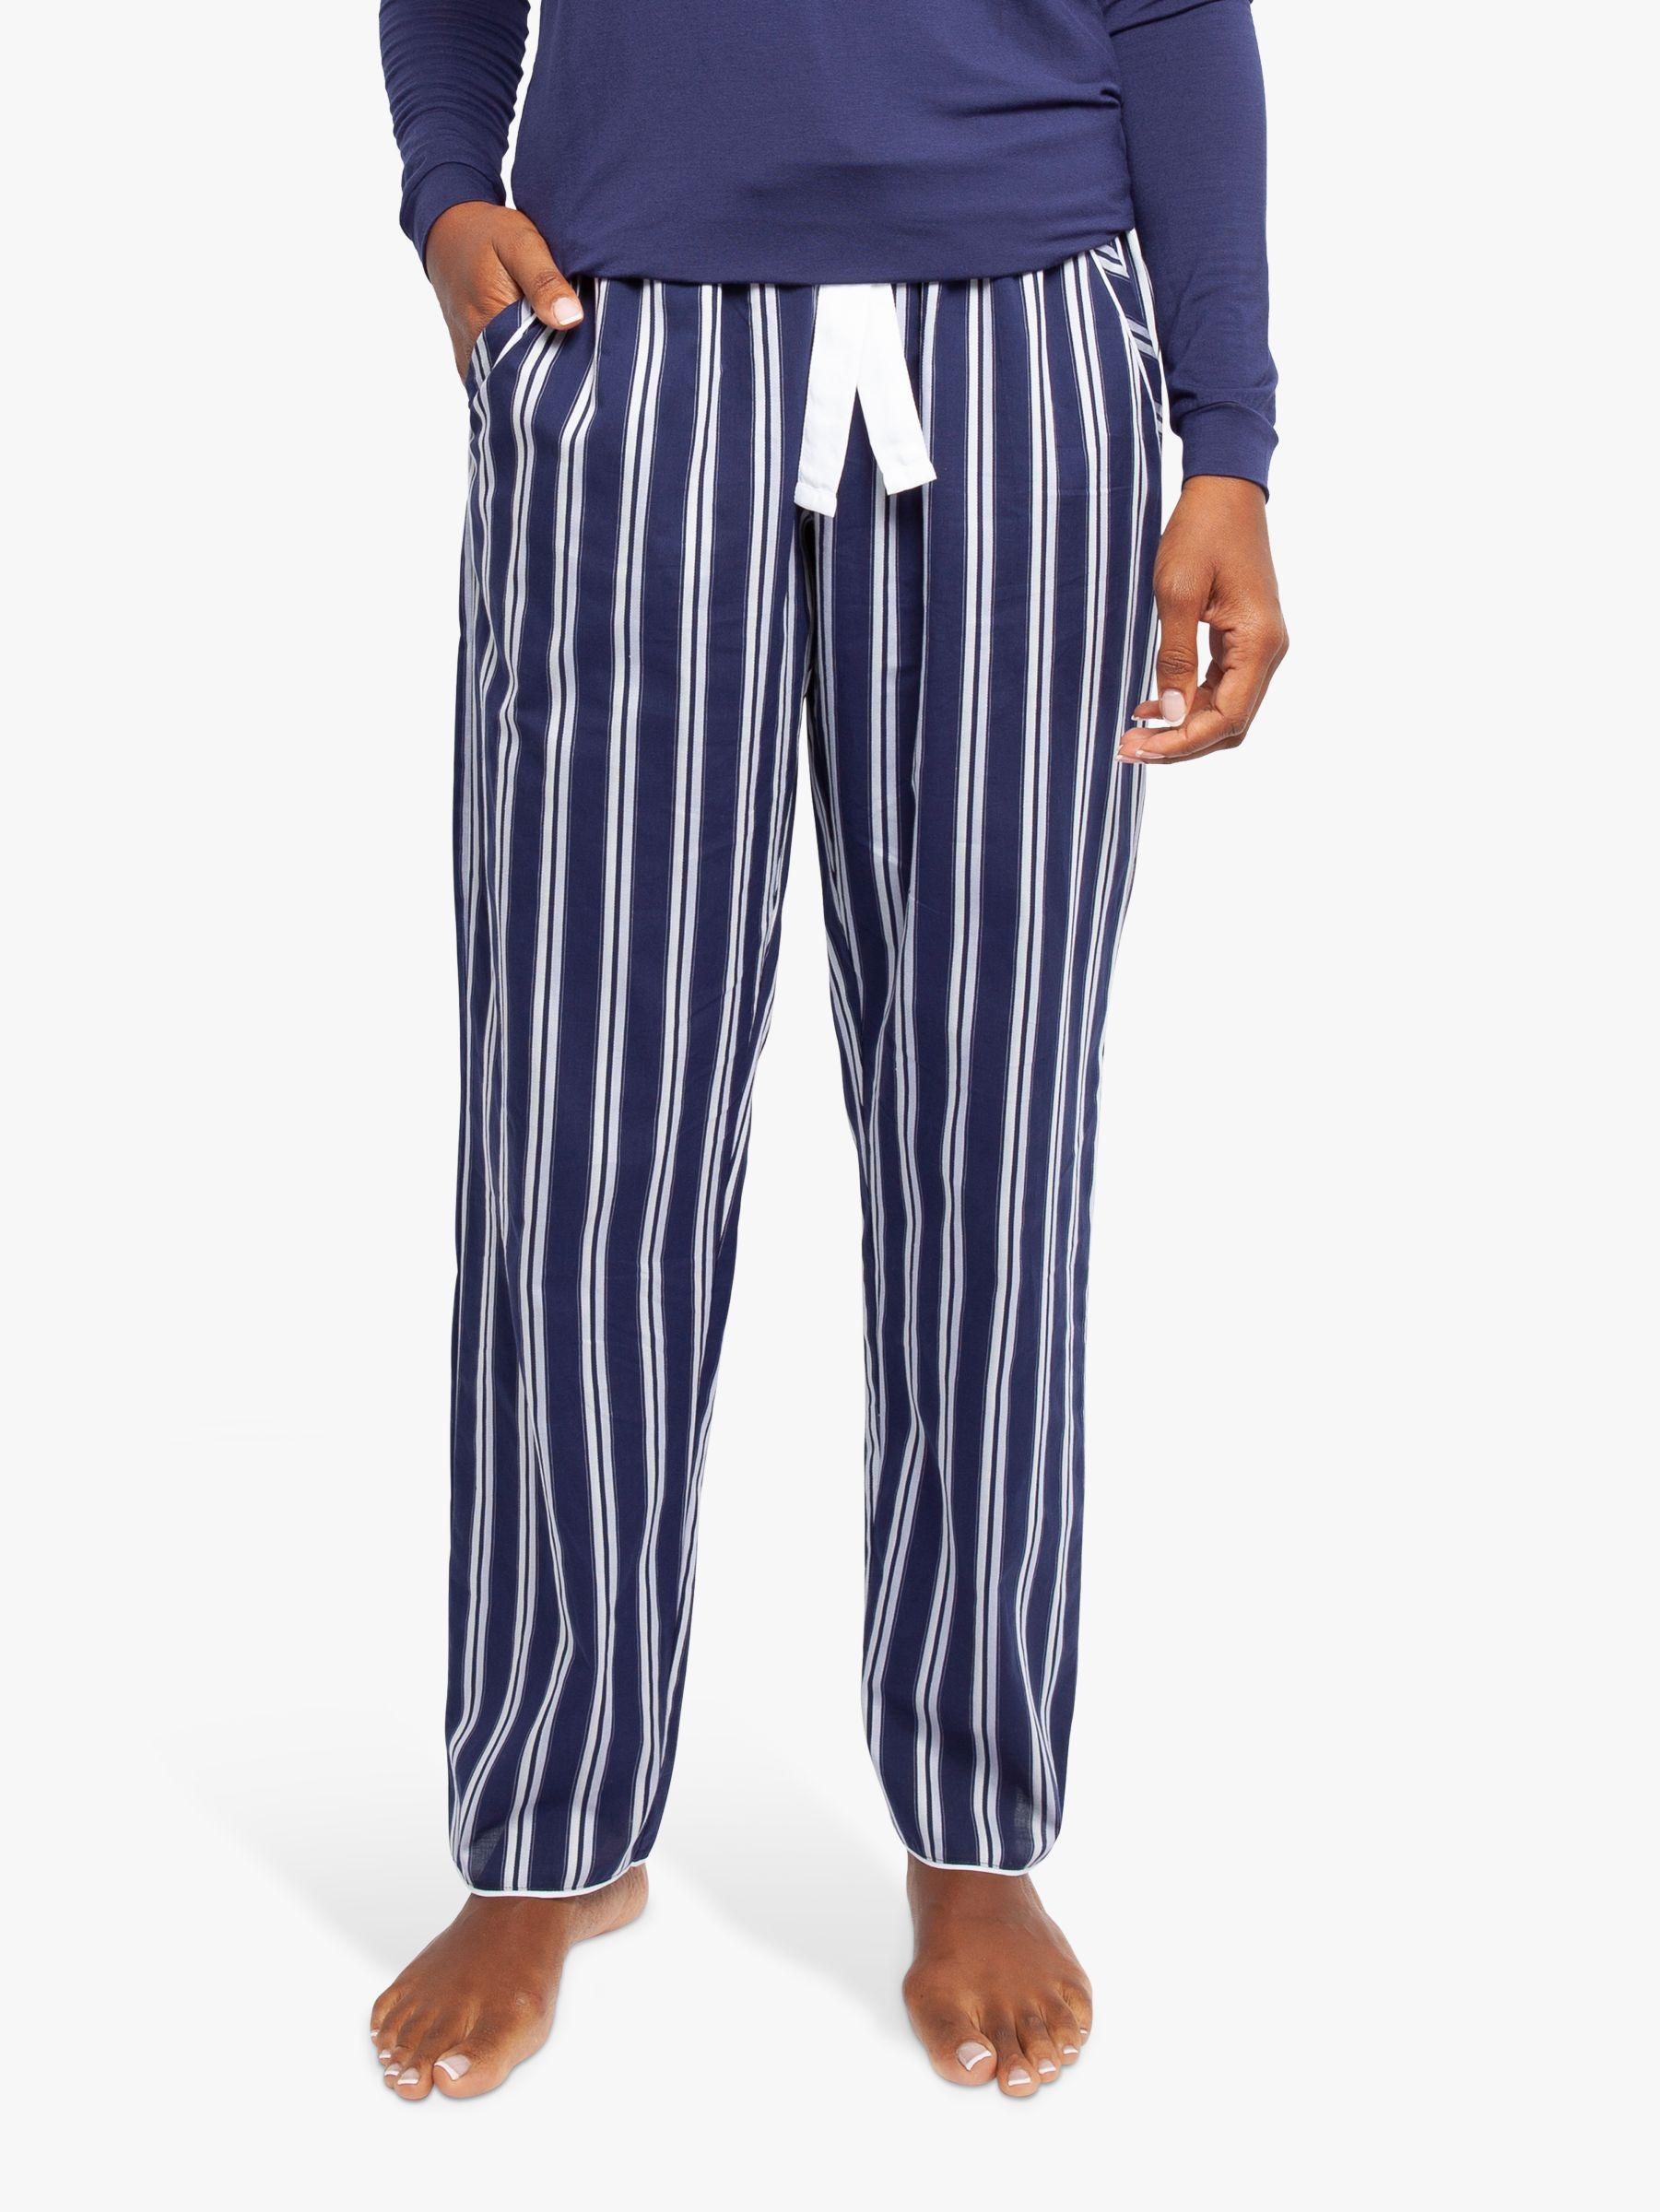 Cyberjammies Cyberjammies Heather Stripe Pyjama Bottoms, Dark Blue